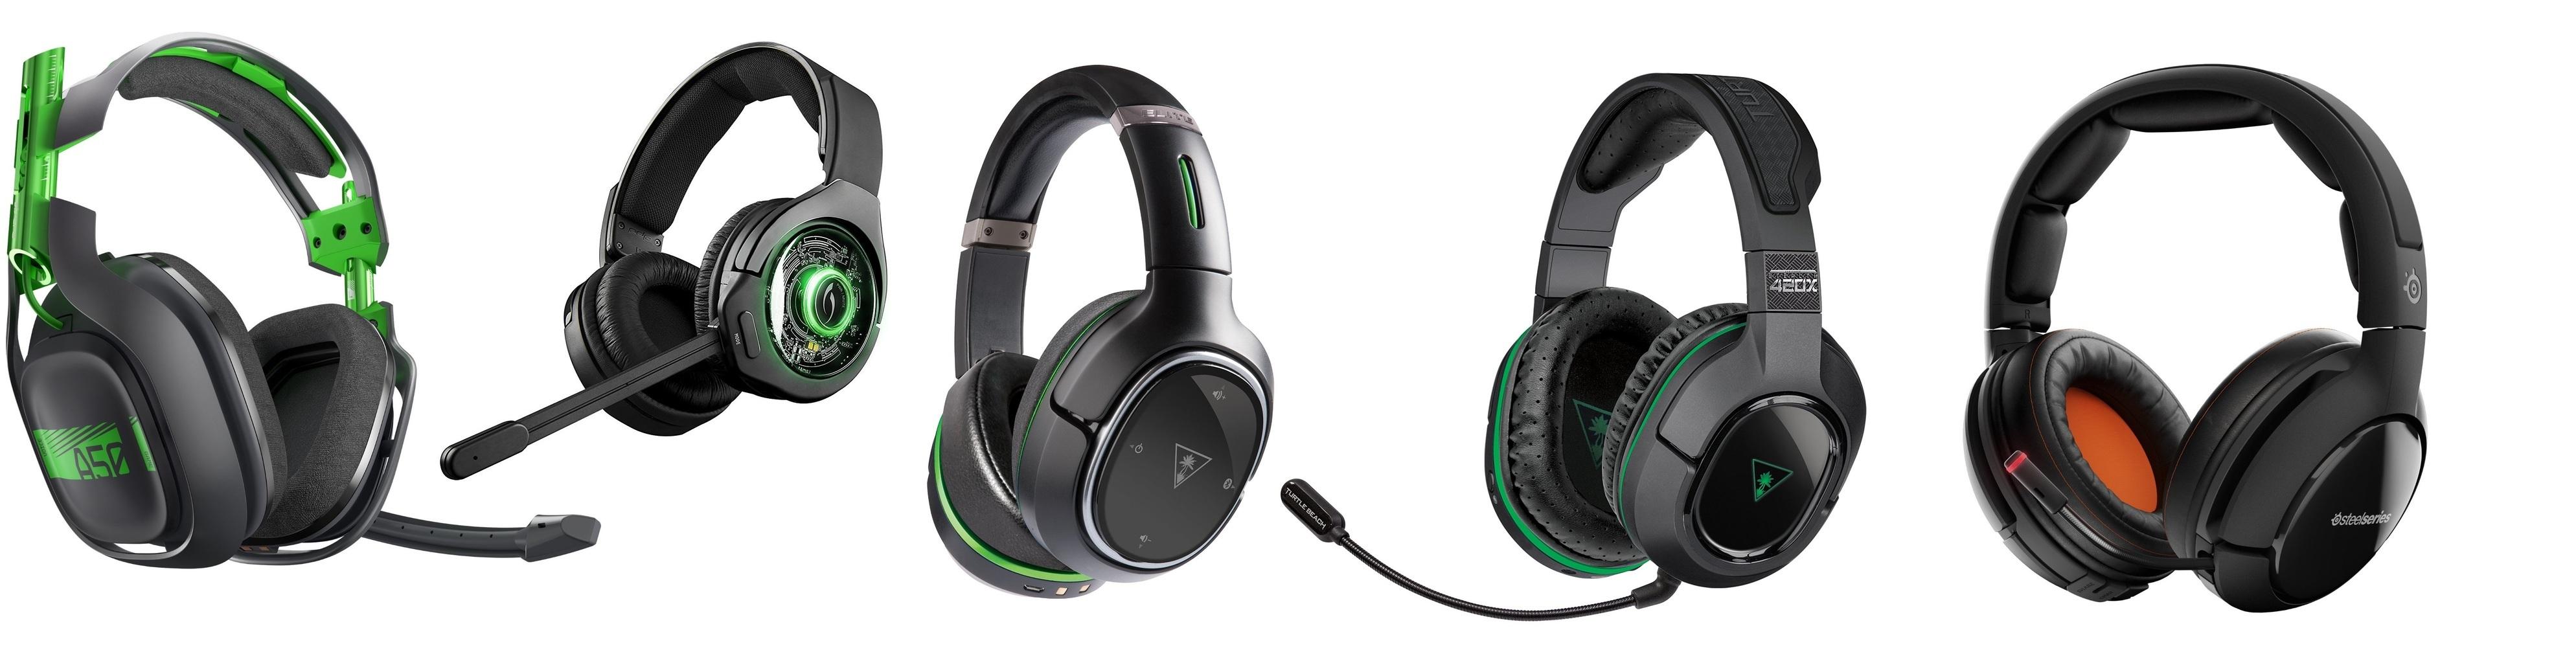 5 Best Xbox One Wireless Headsets [2018]